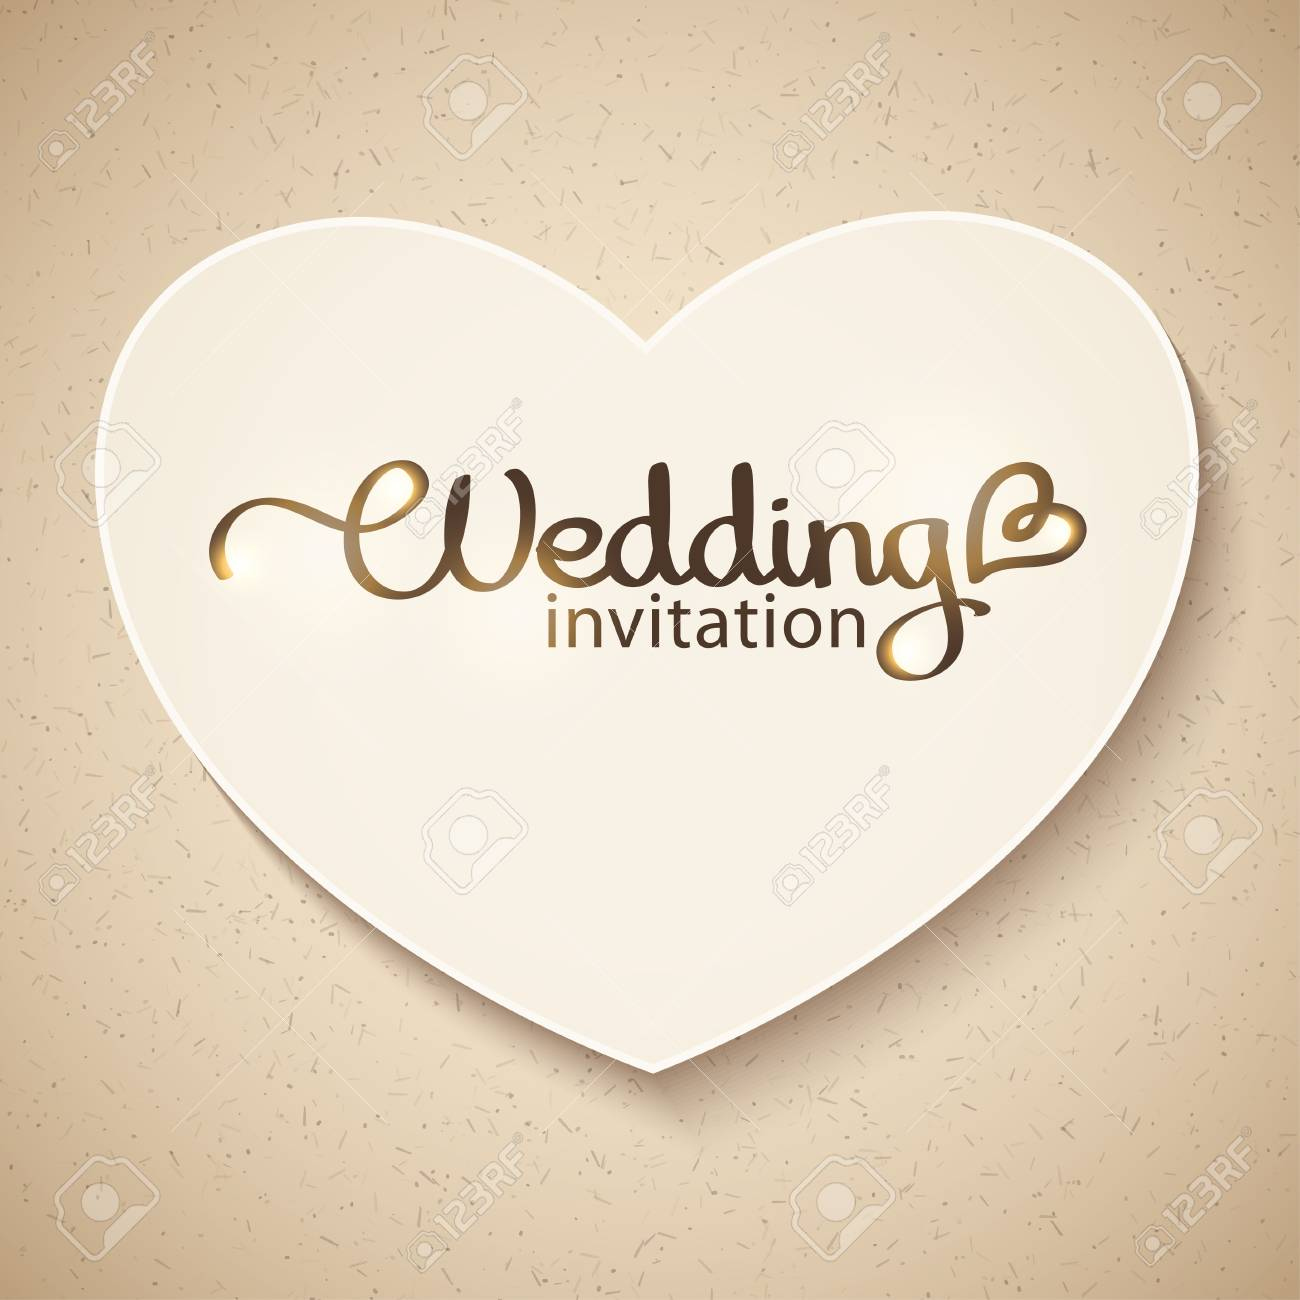 wedding invitation Stock Vector - 19102386